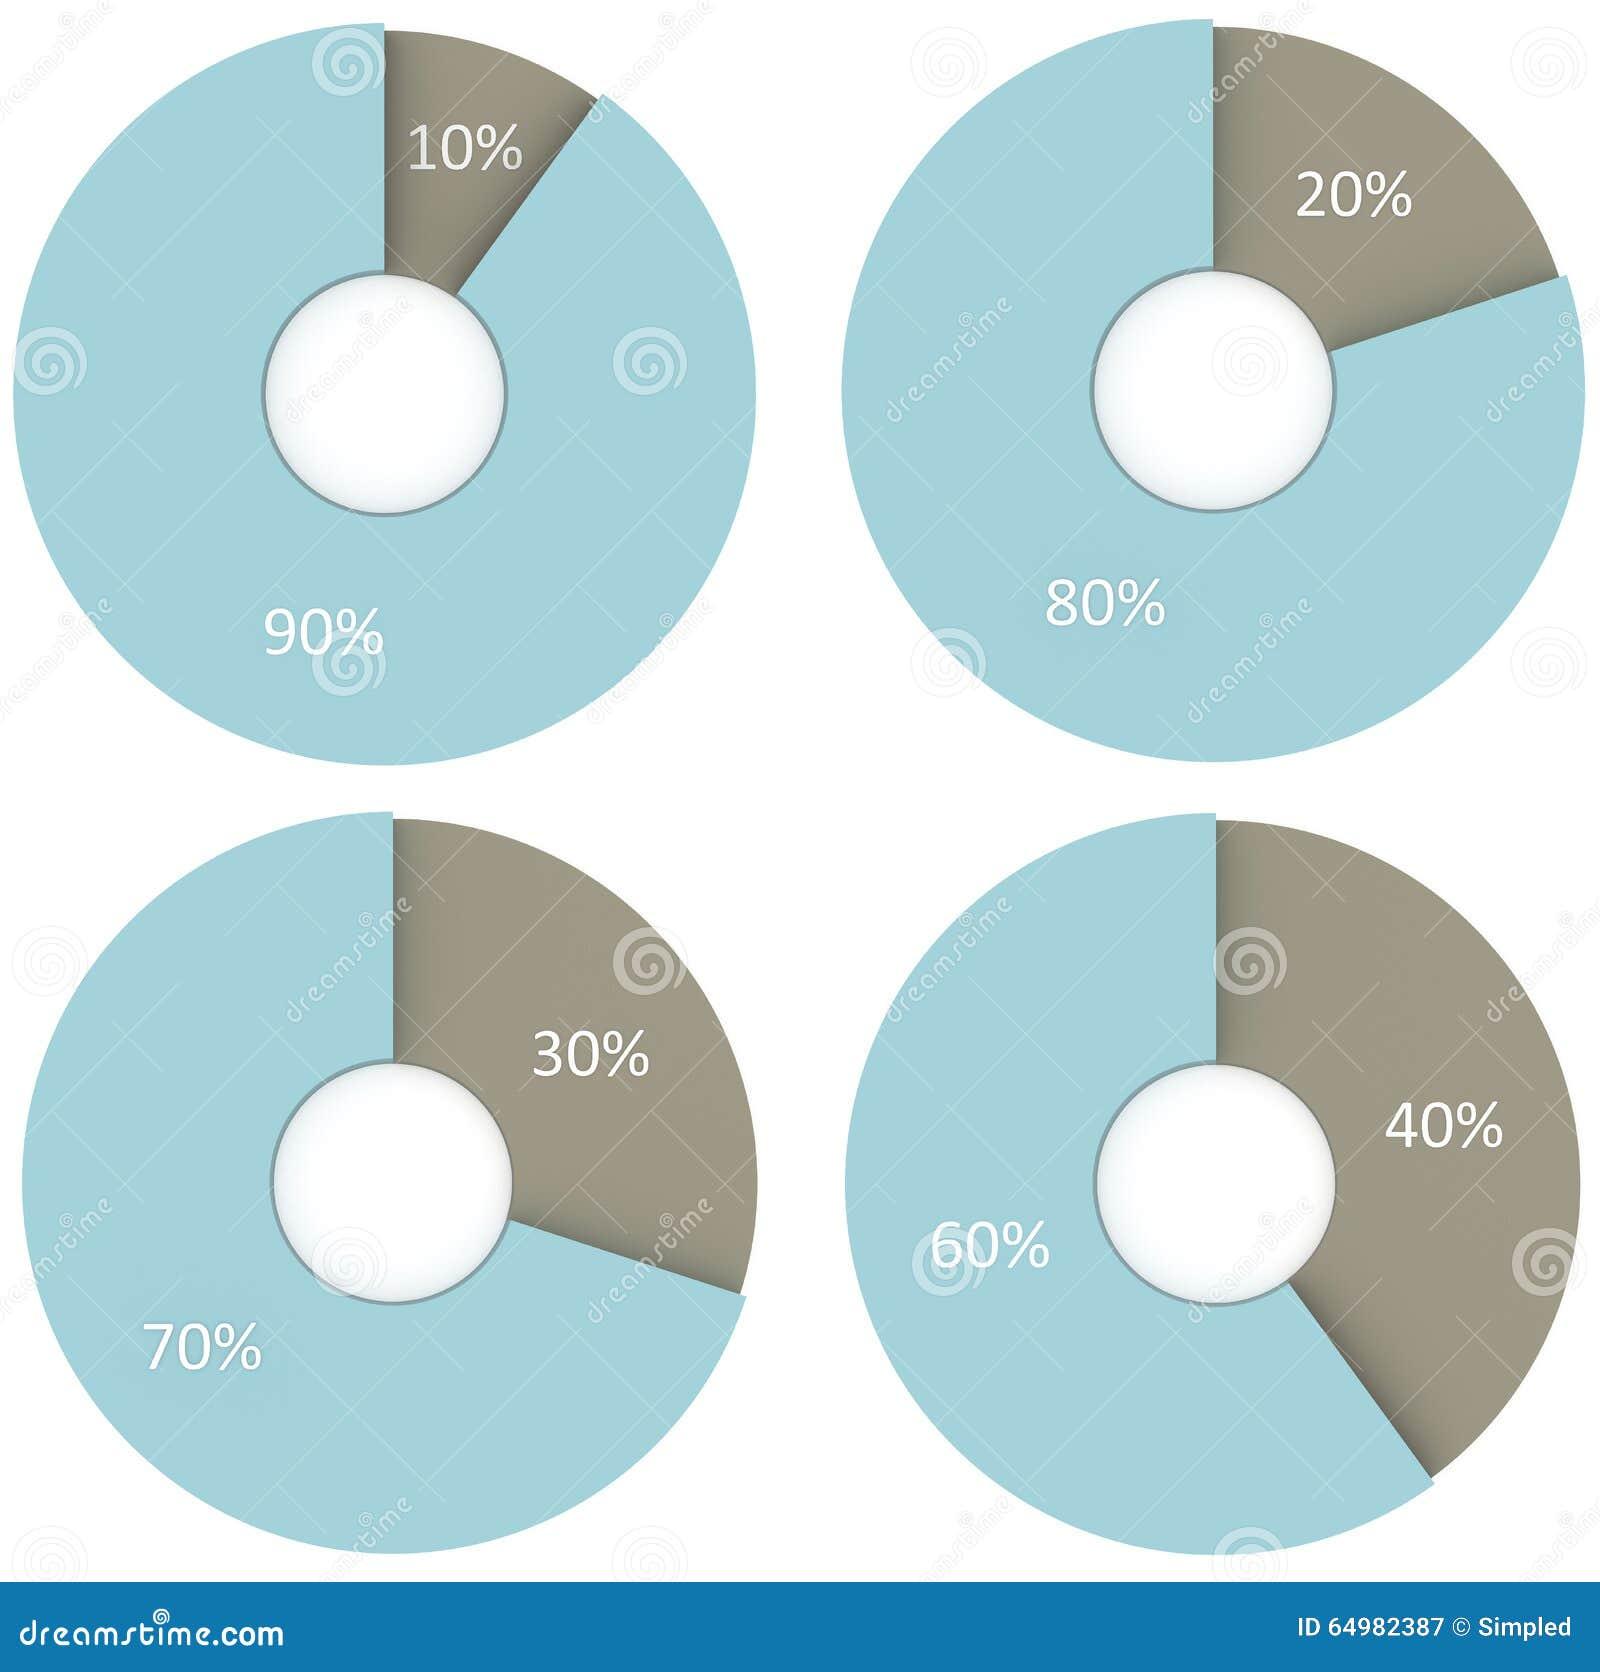 10 20 30 40 90 80 70 60 percent pie charts. Circle diagrams infographics set. 3d render business illustrations